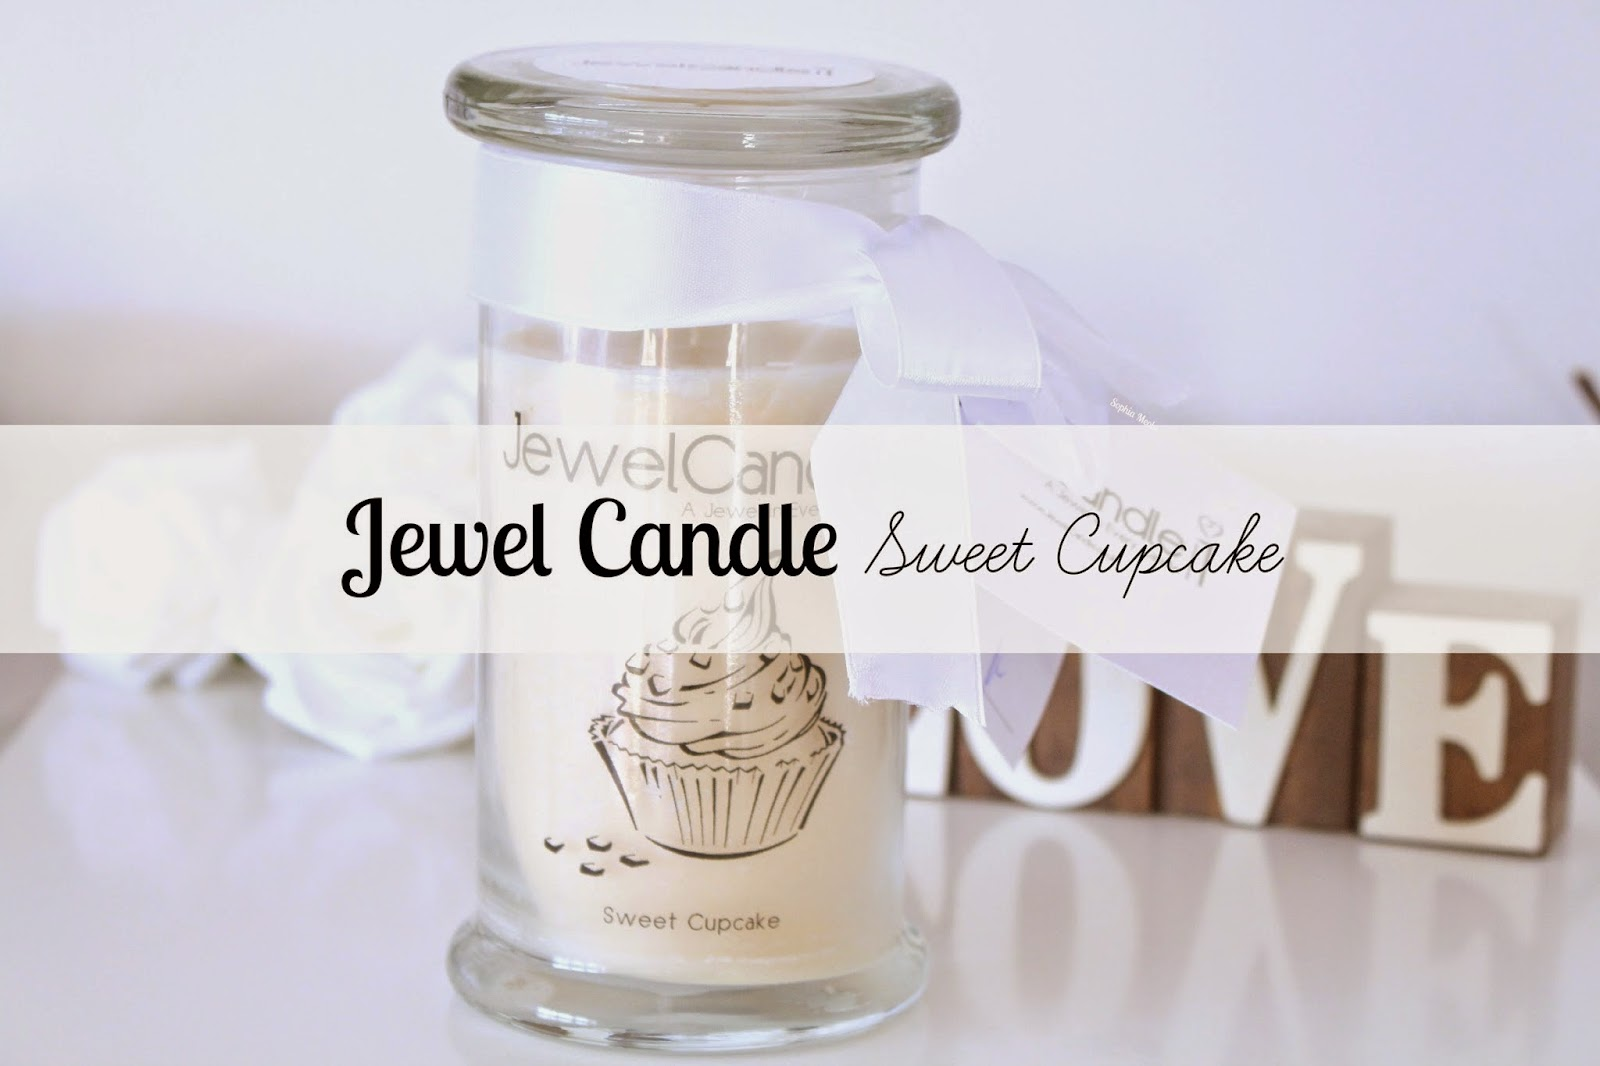 jewel candle sweet cupcake sophia meola a beauty fashion lifestyle blog. Black Bedroom Furniture Sets. Home Design Ideas